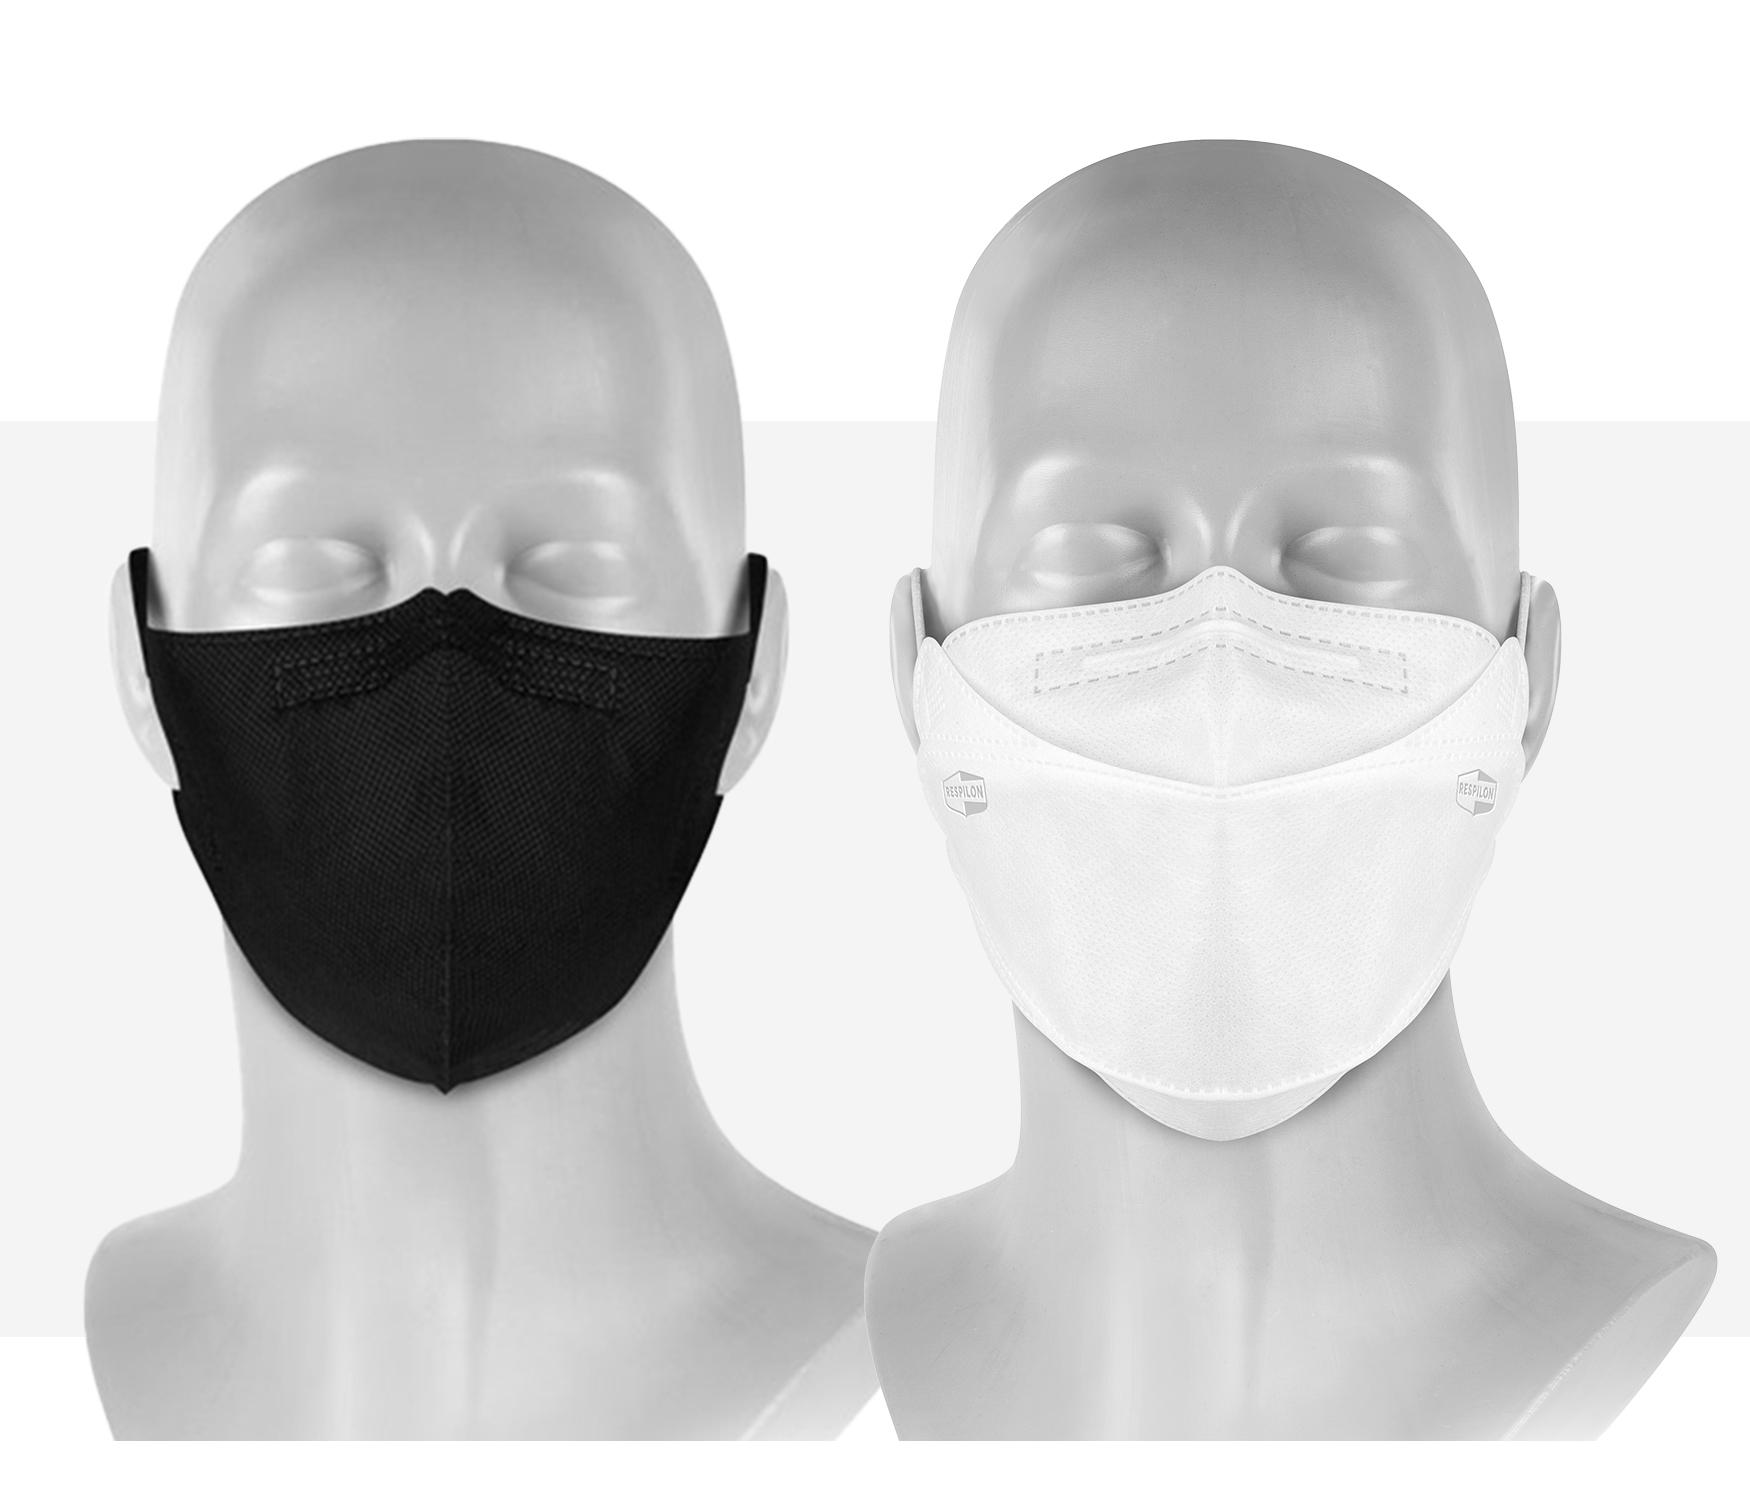 Respilon antiviral respirators on mannequins